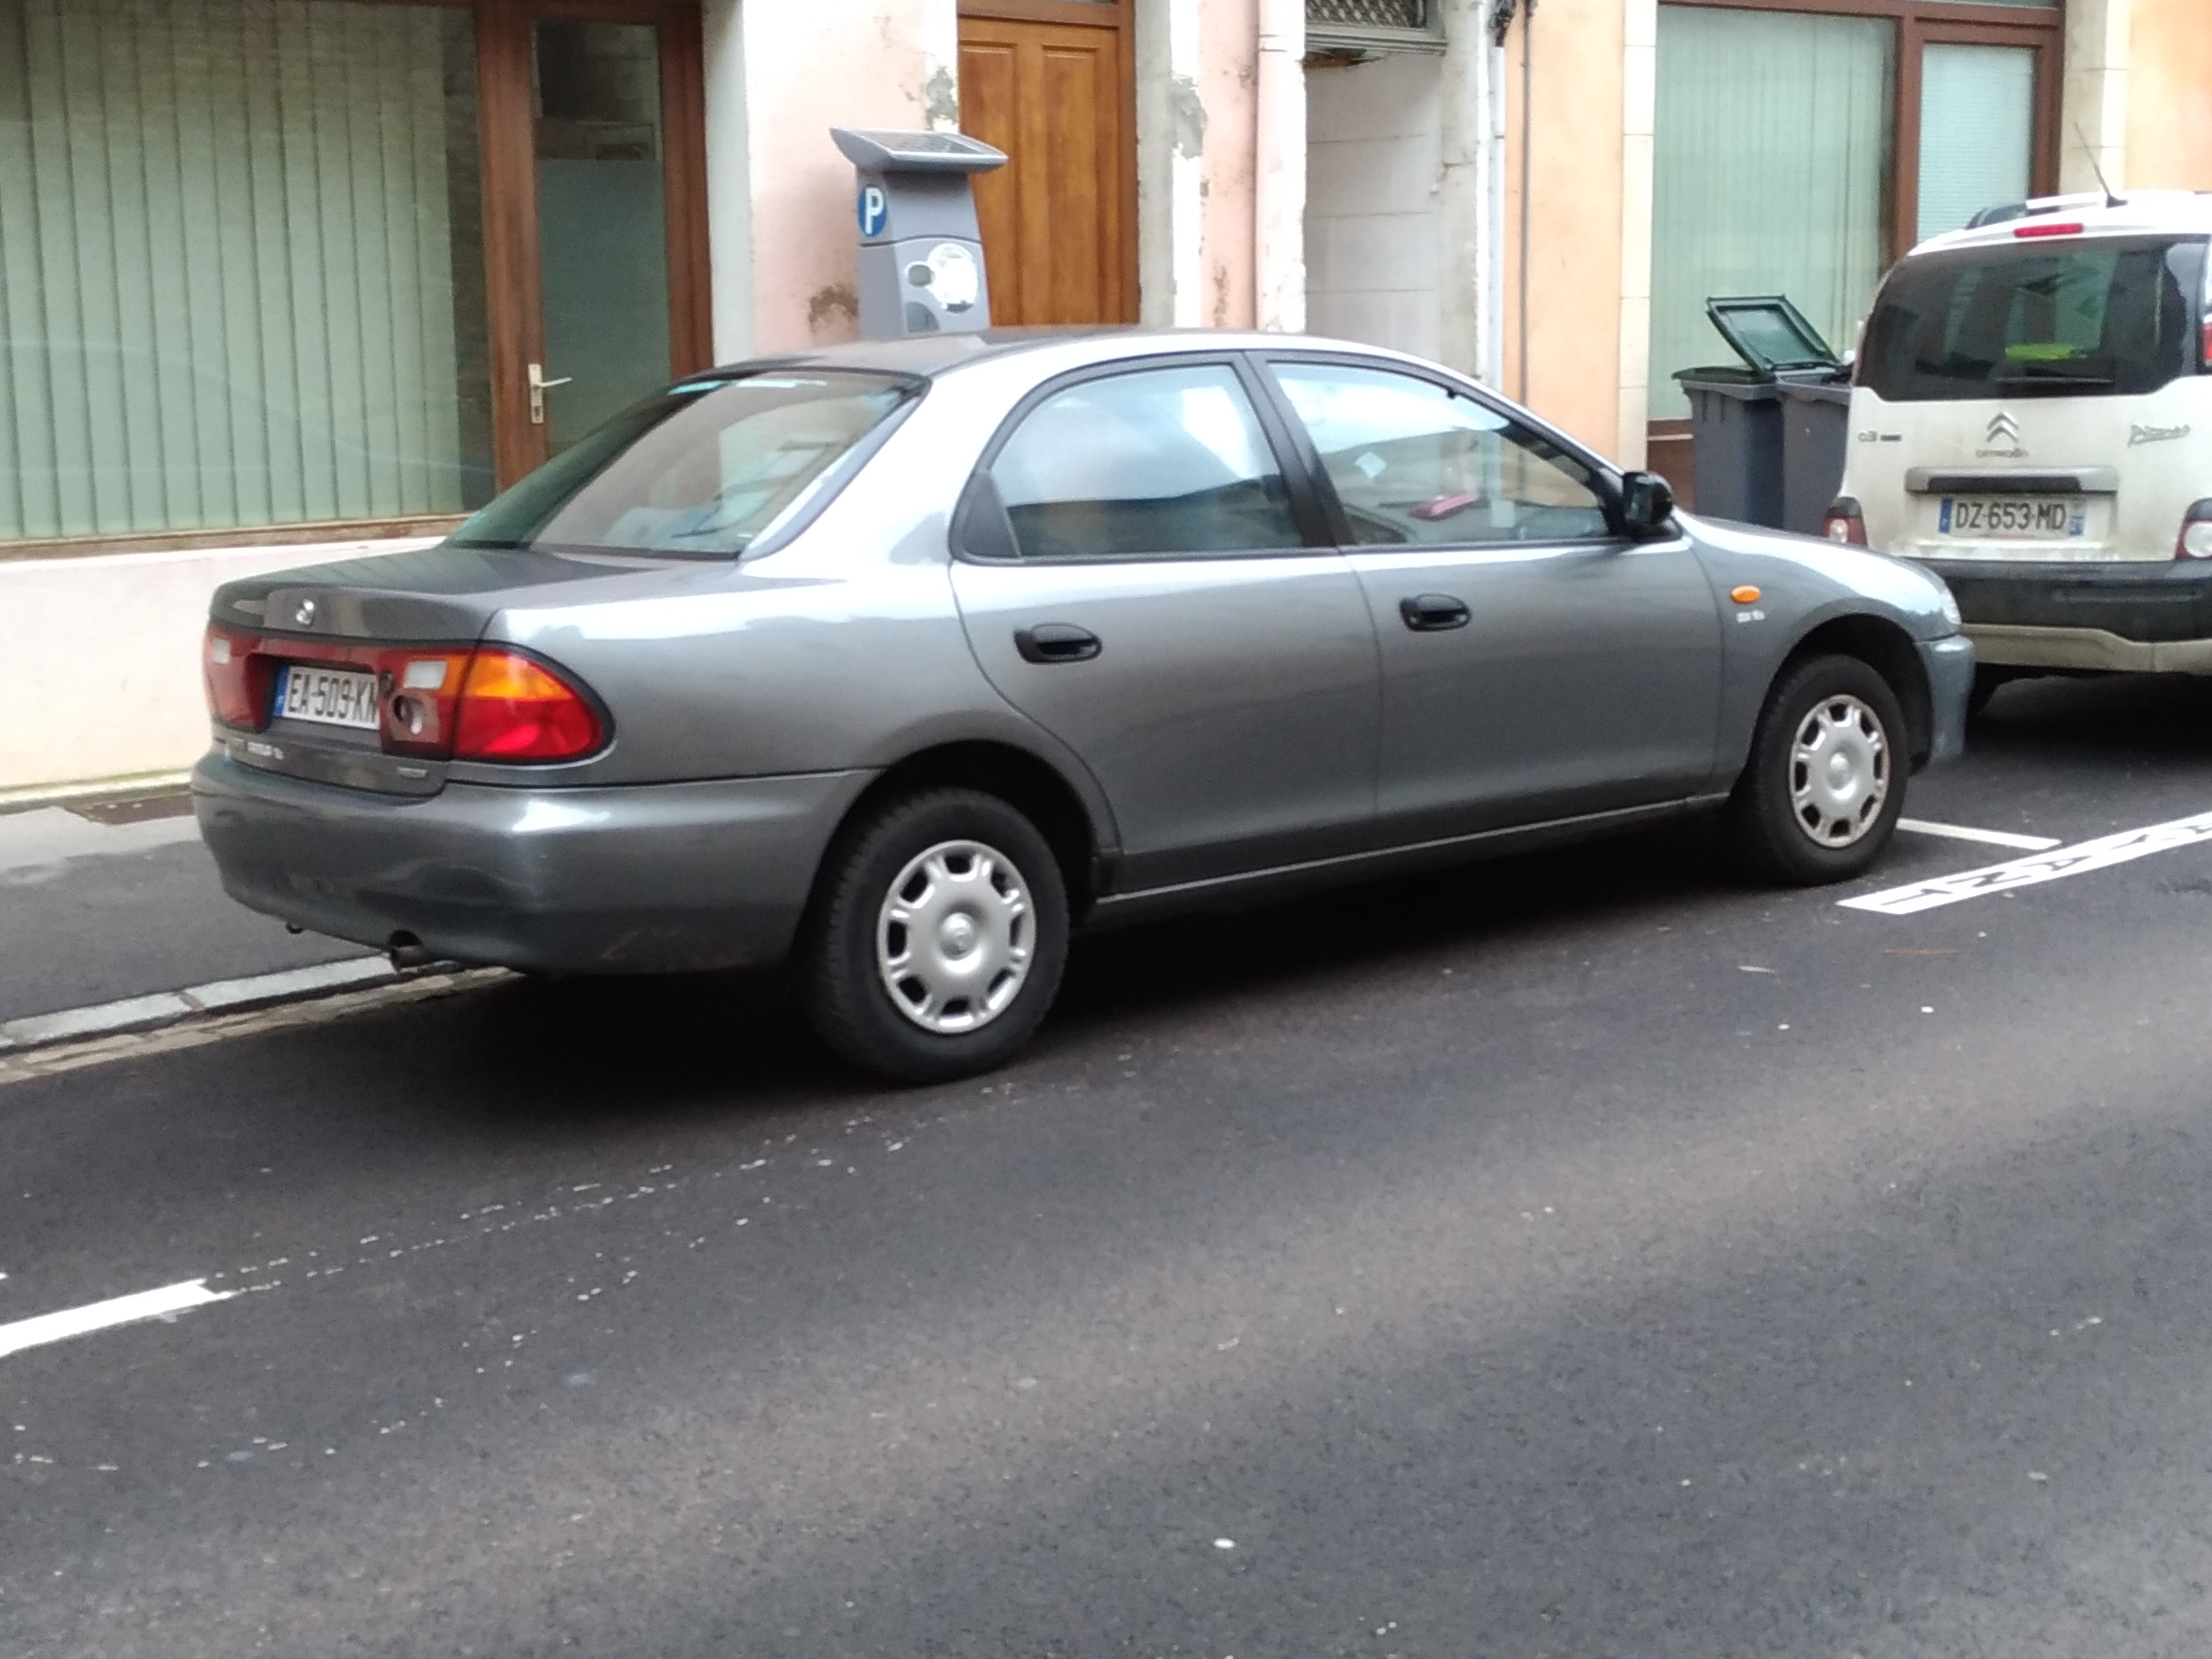 Kelebihan Kekurangan Mazda 323 Familia Tangguh